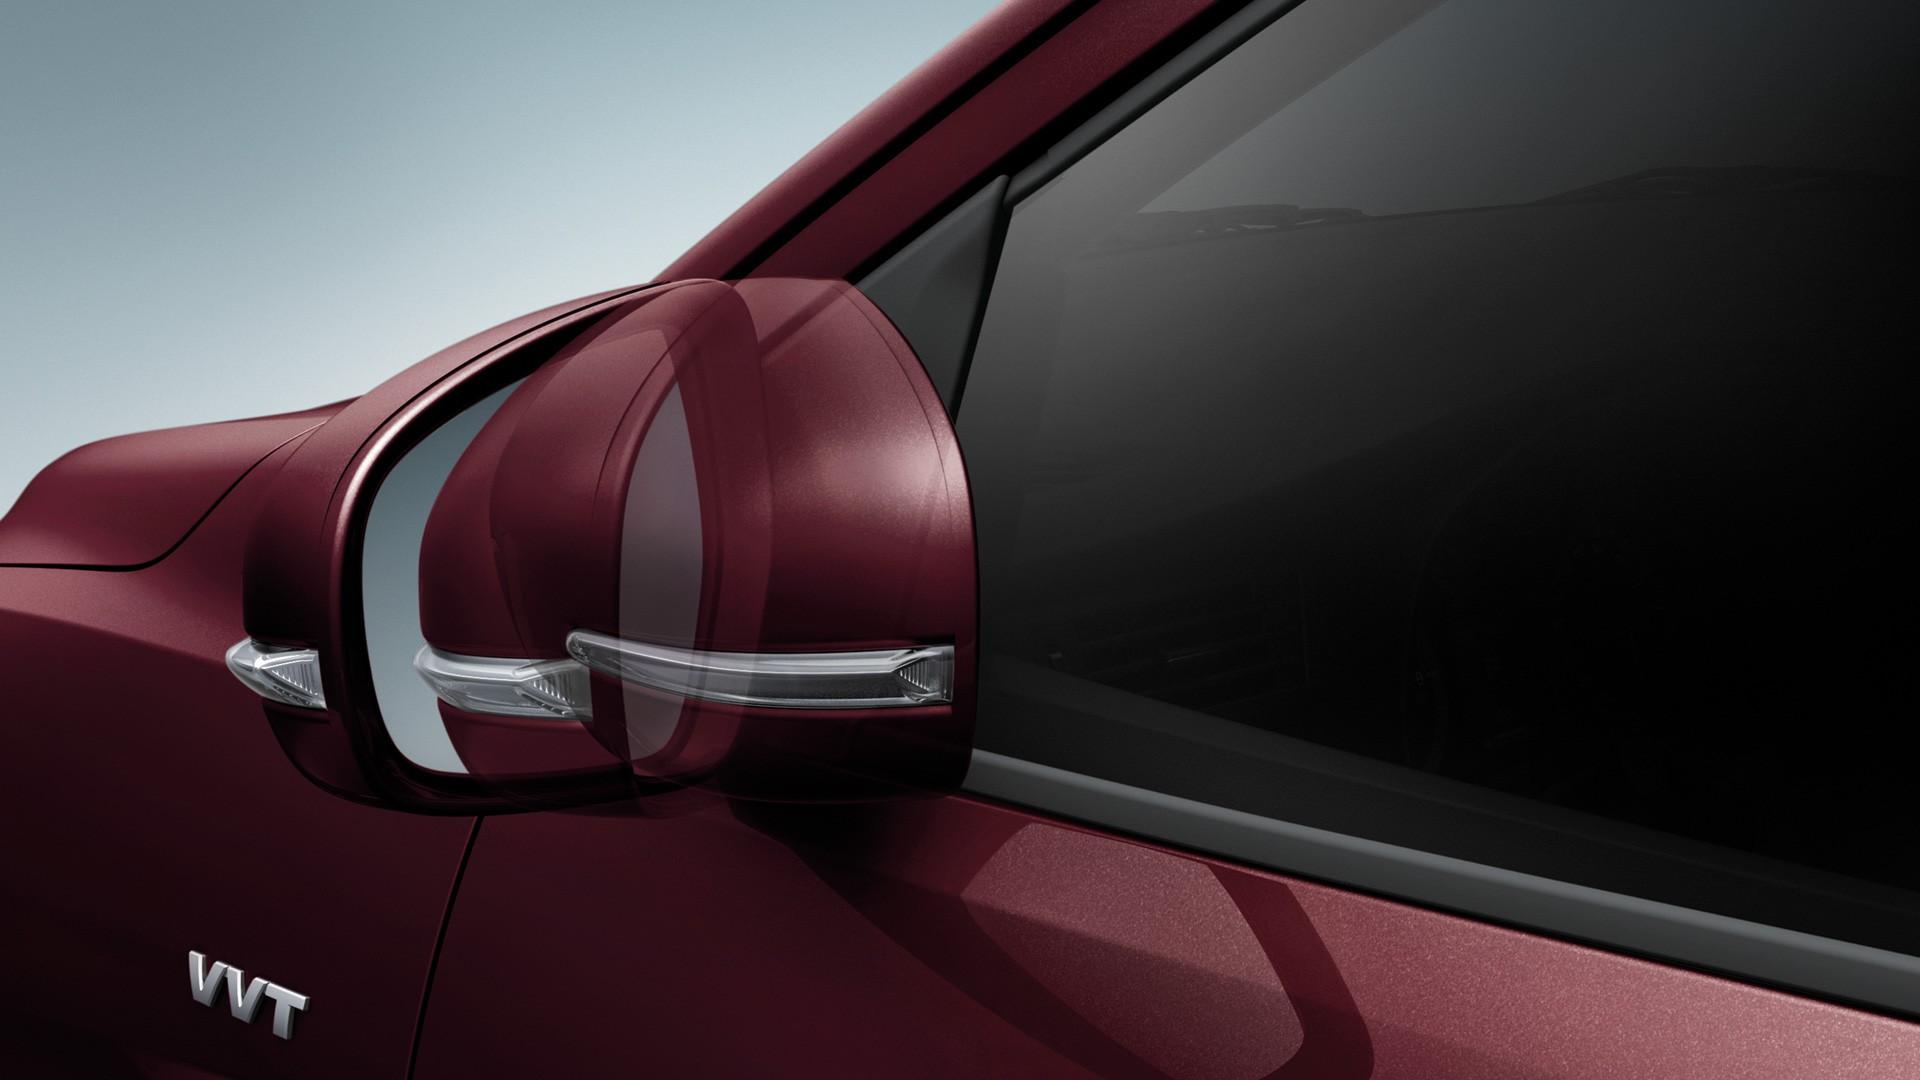 Suzuki ERTIGA กระจกมองข้างปรับและพับด้วยระบบไฟฟ้า